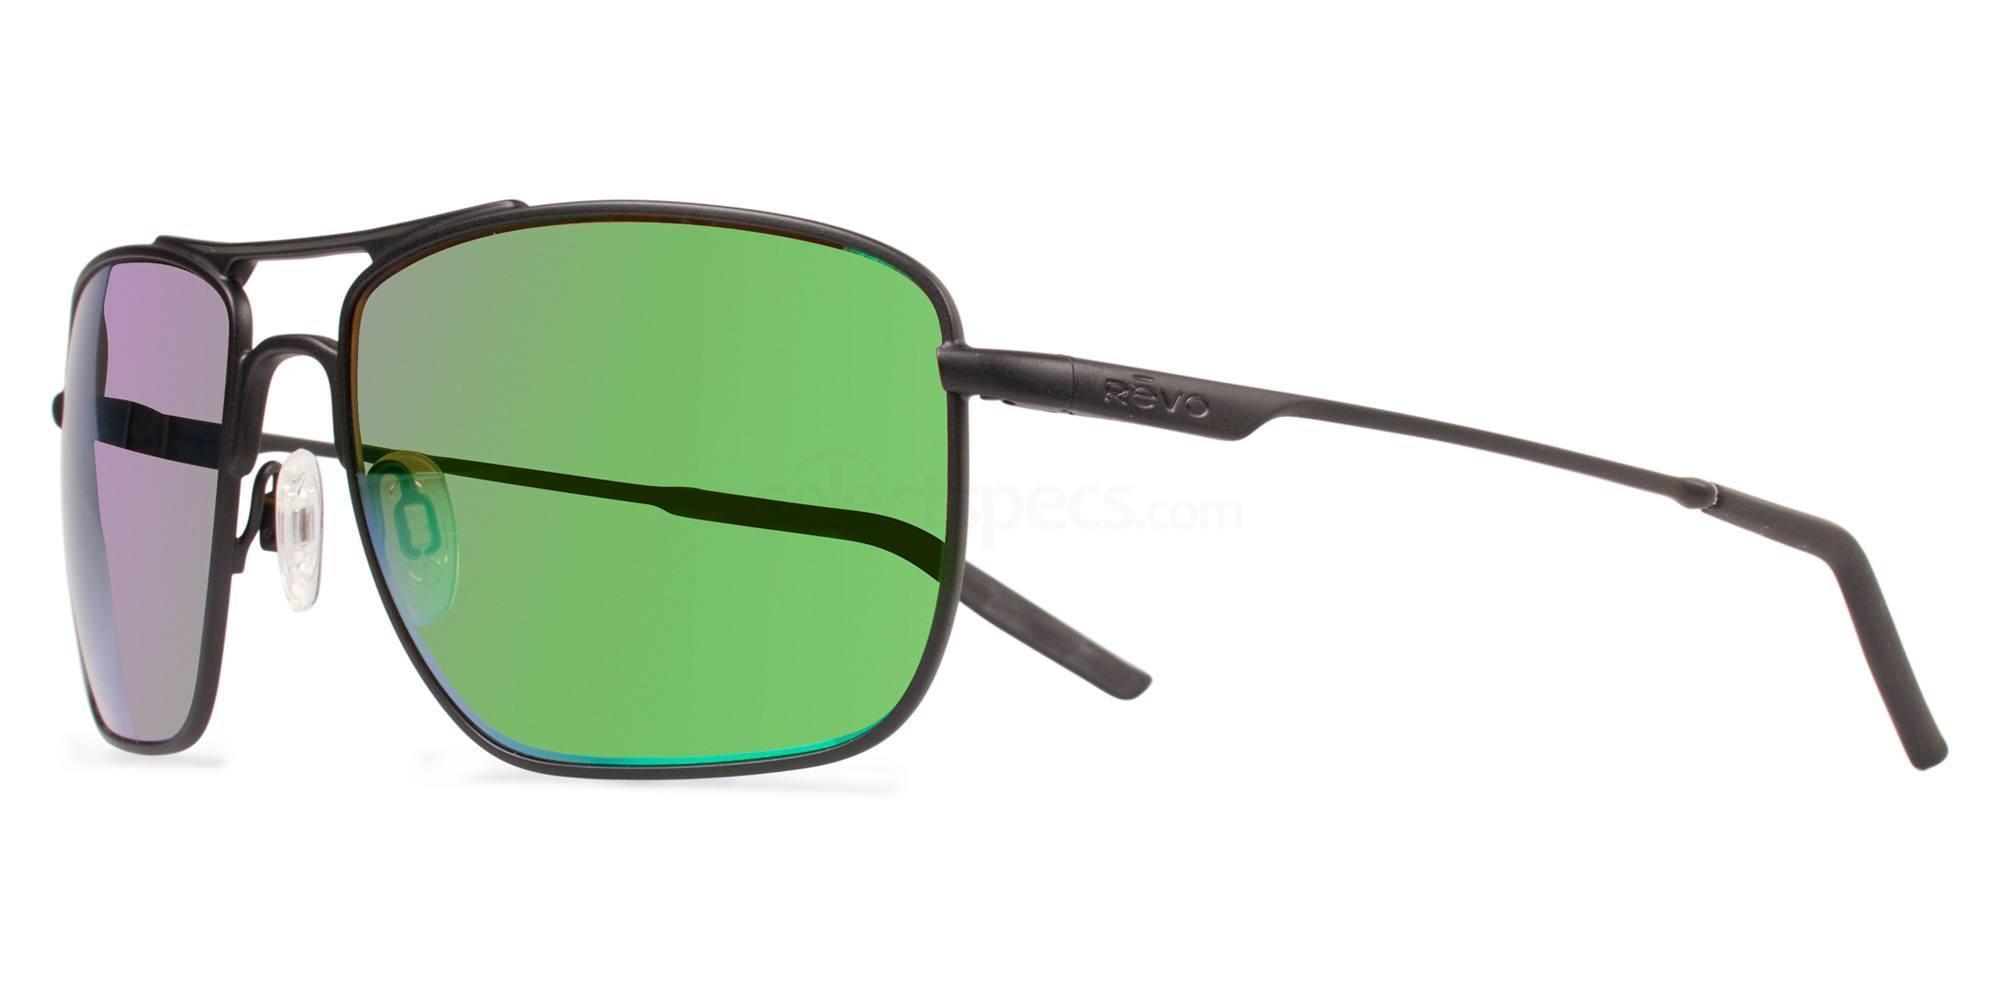 01GN Groundspeed - 353089 Sunglasses, Revo